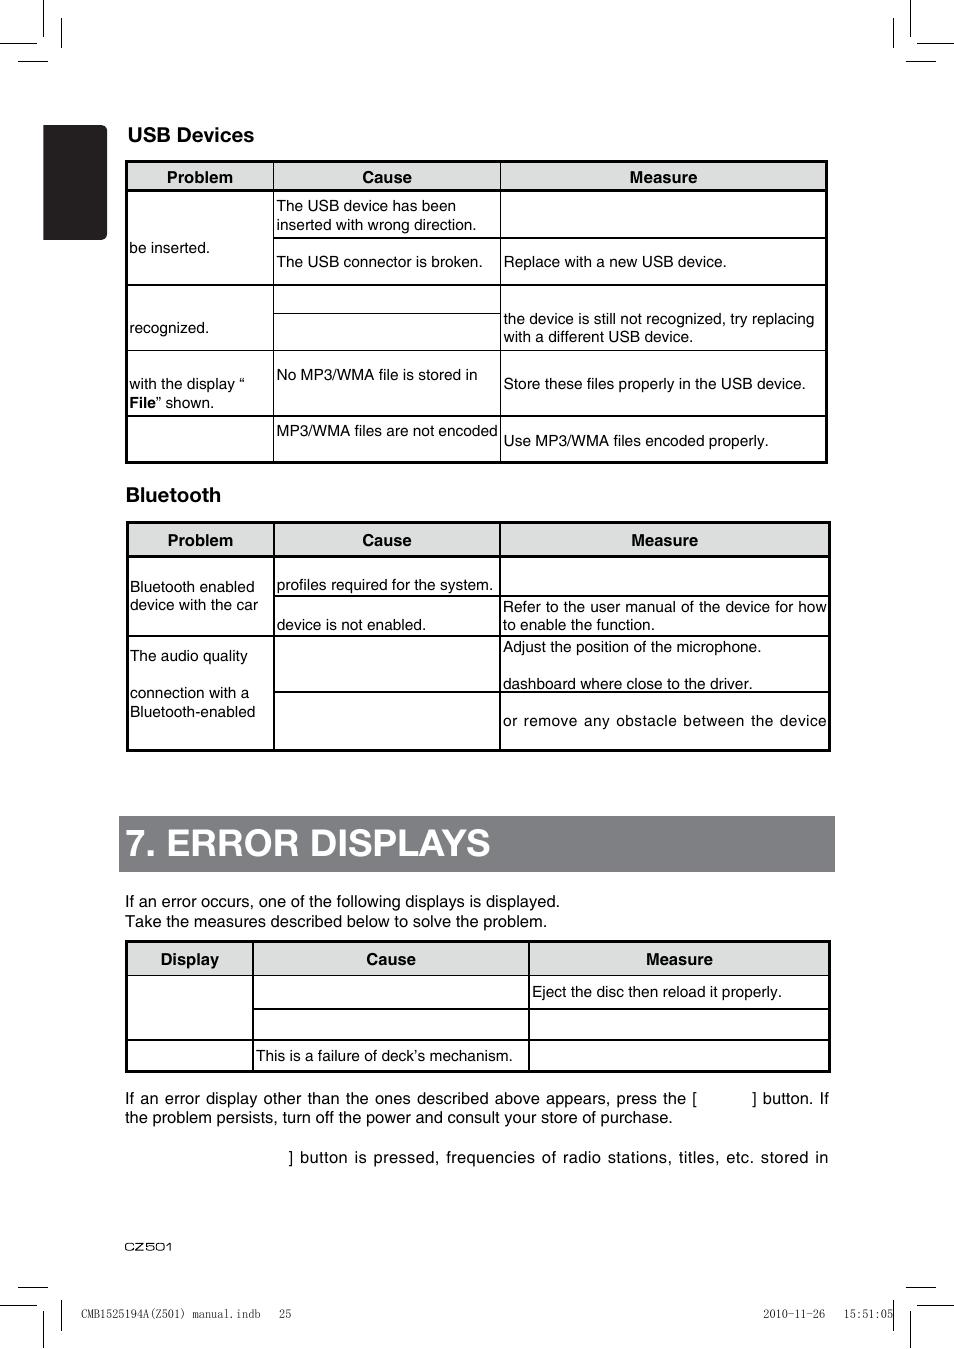 error displays usb devices bluetooth clarion cz501 user manual rh manualsdir com Clarion Car Stereo Clarion CMD5